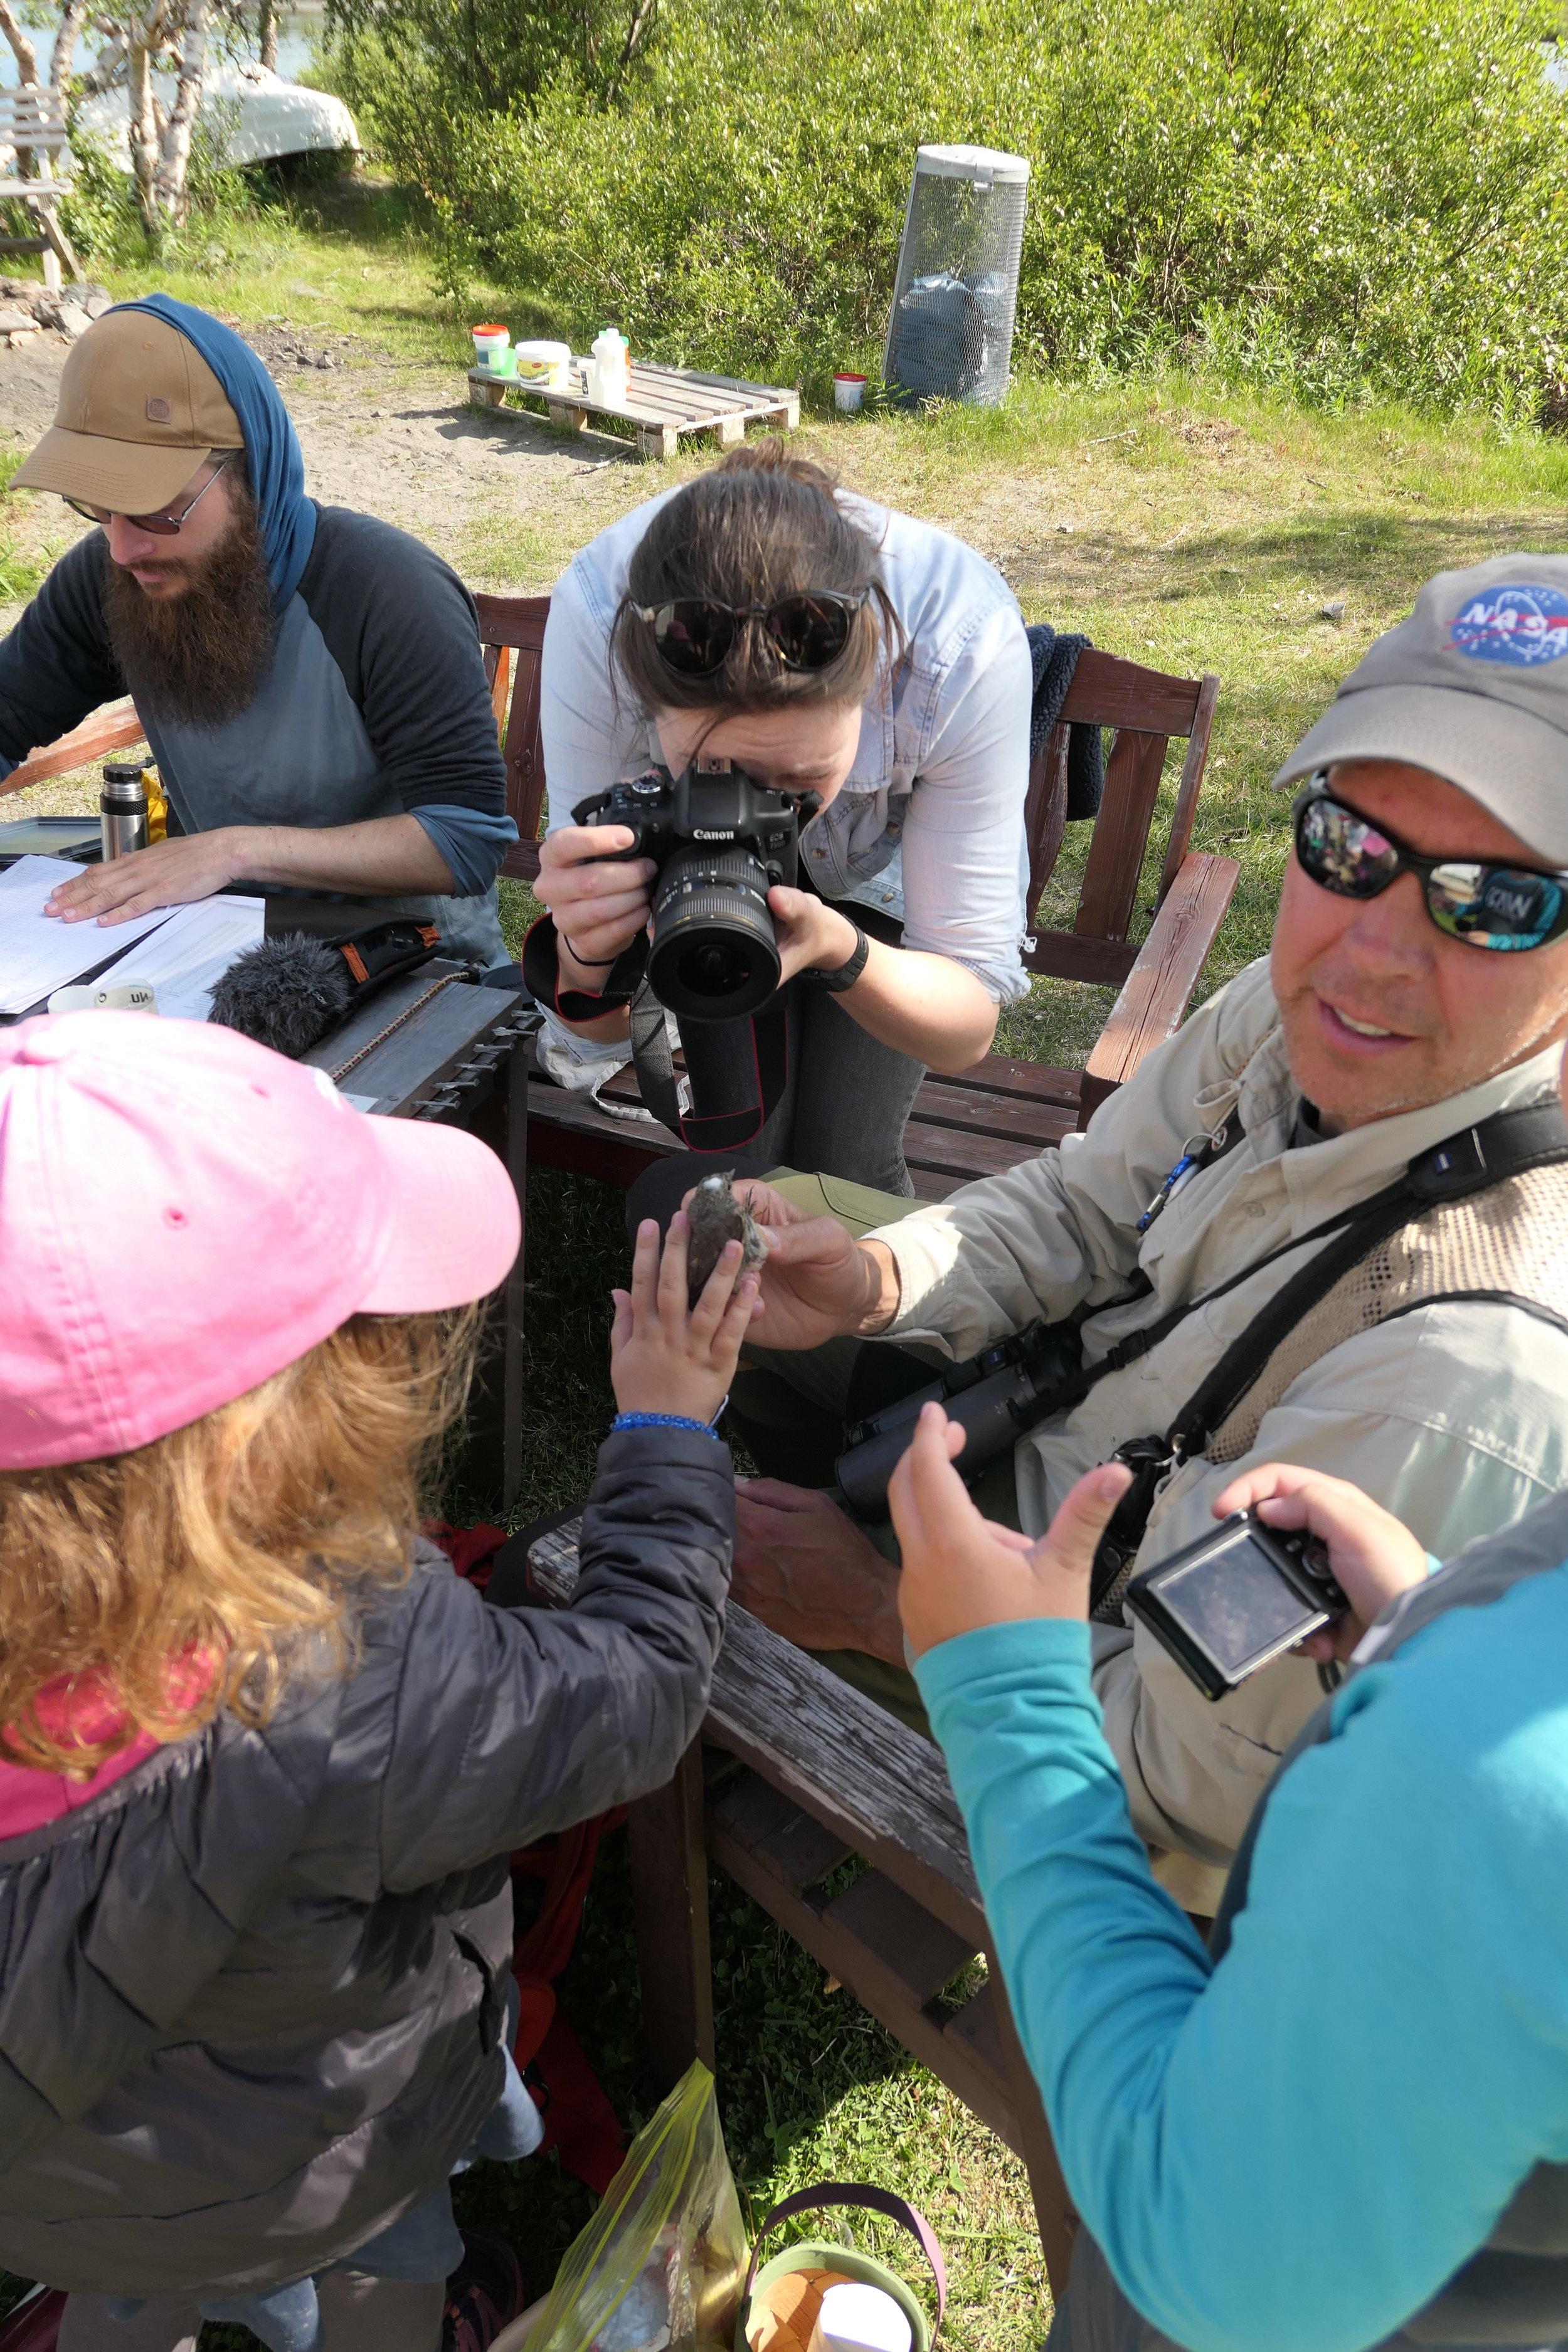 Visitors at bird ringing, Photo by Joëlle Winnemöller